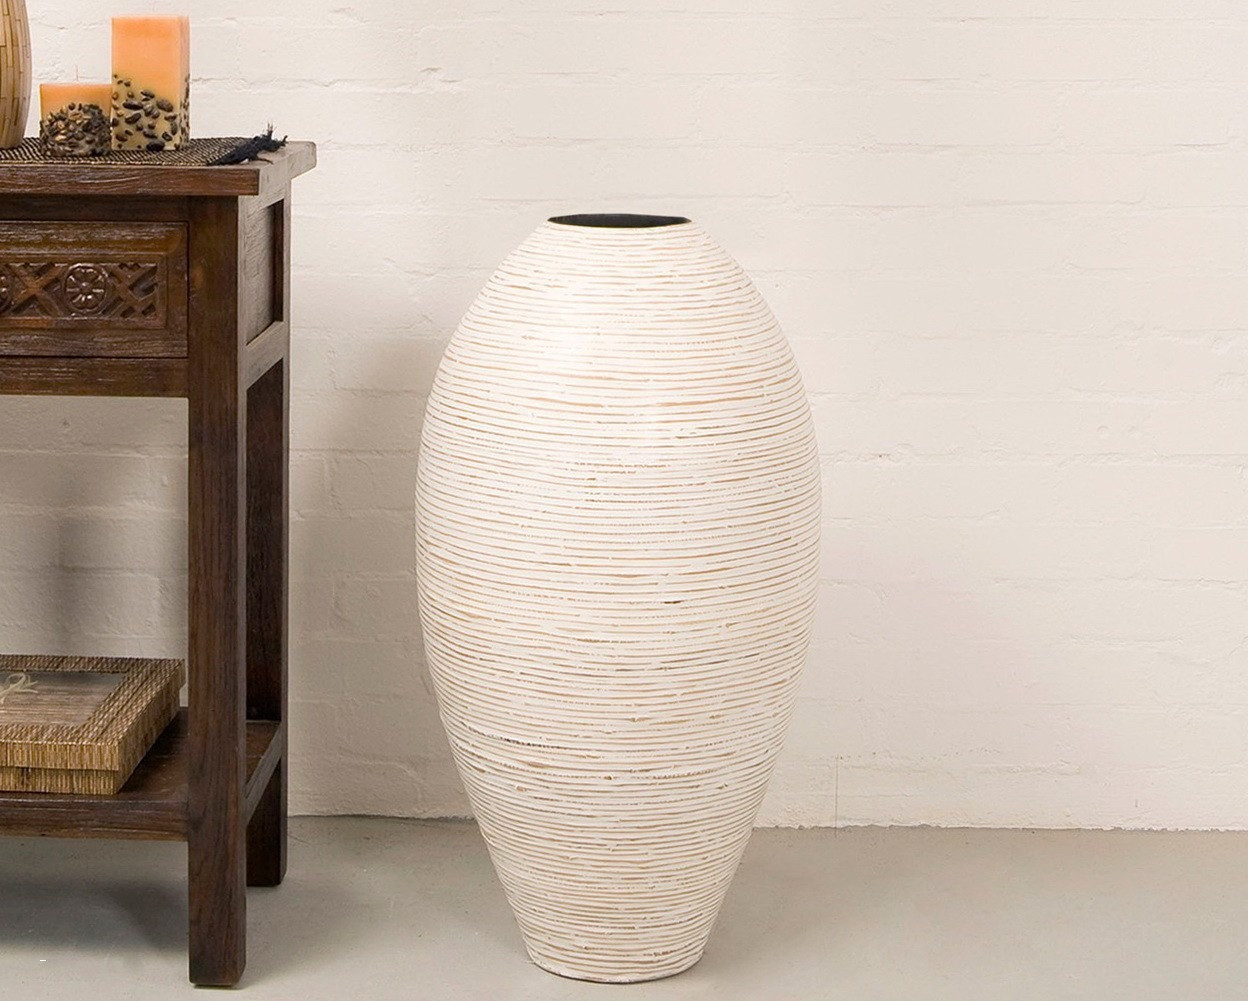 vase with stand of ikea standing lamps luxury ikea floor lamp best pe s5h vases ikea for ikea standing lamps luxury ikea floor lamp best pe s5h vases ikea floor i 0d tall